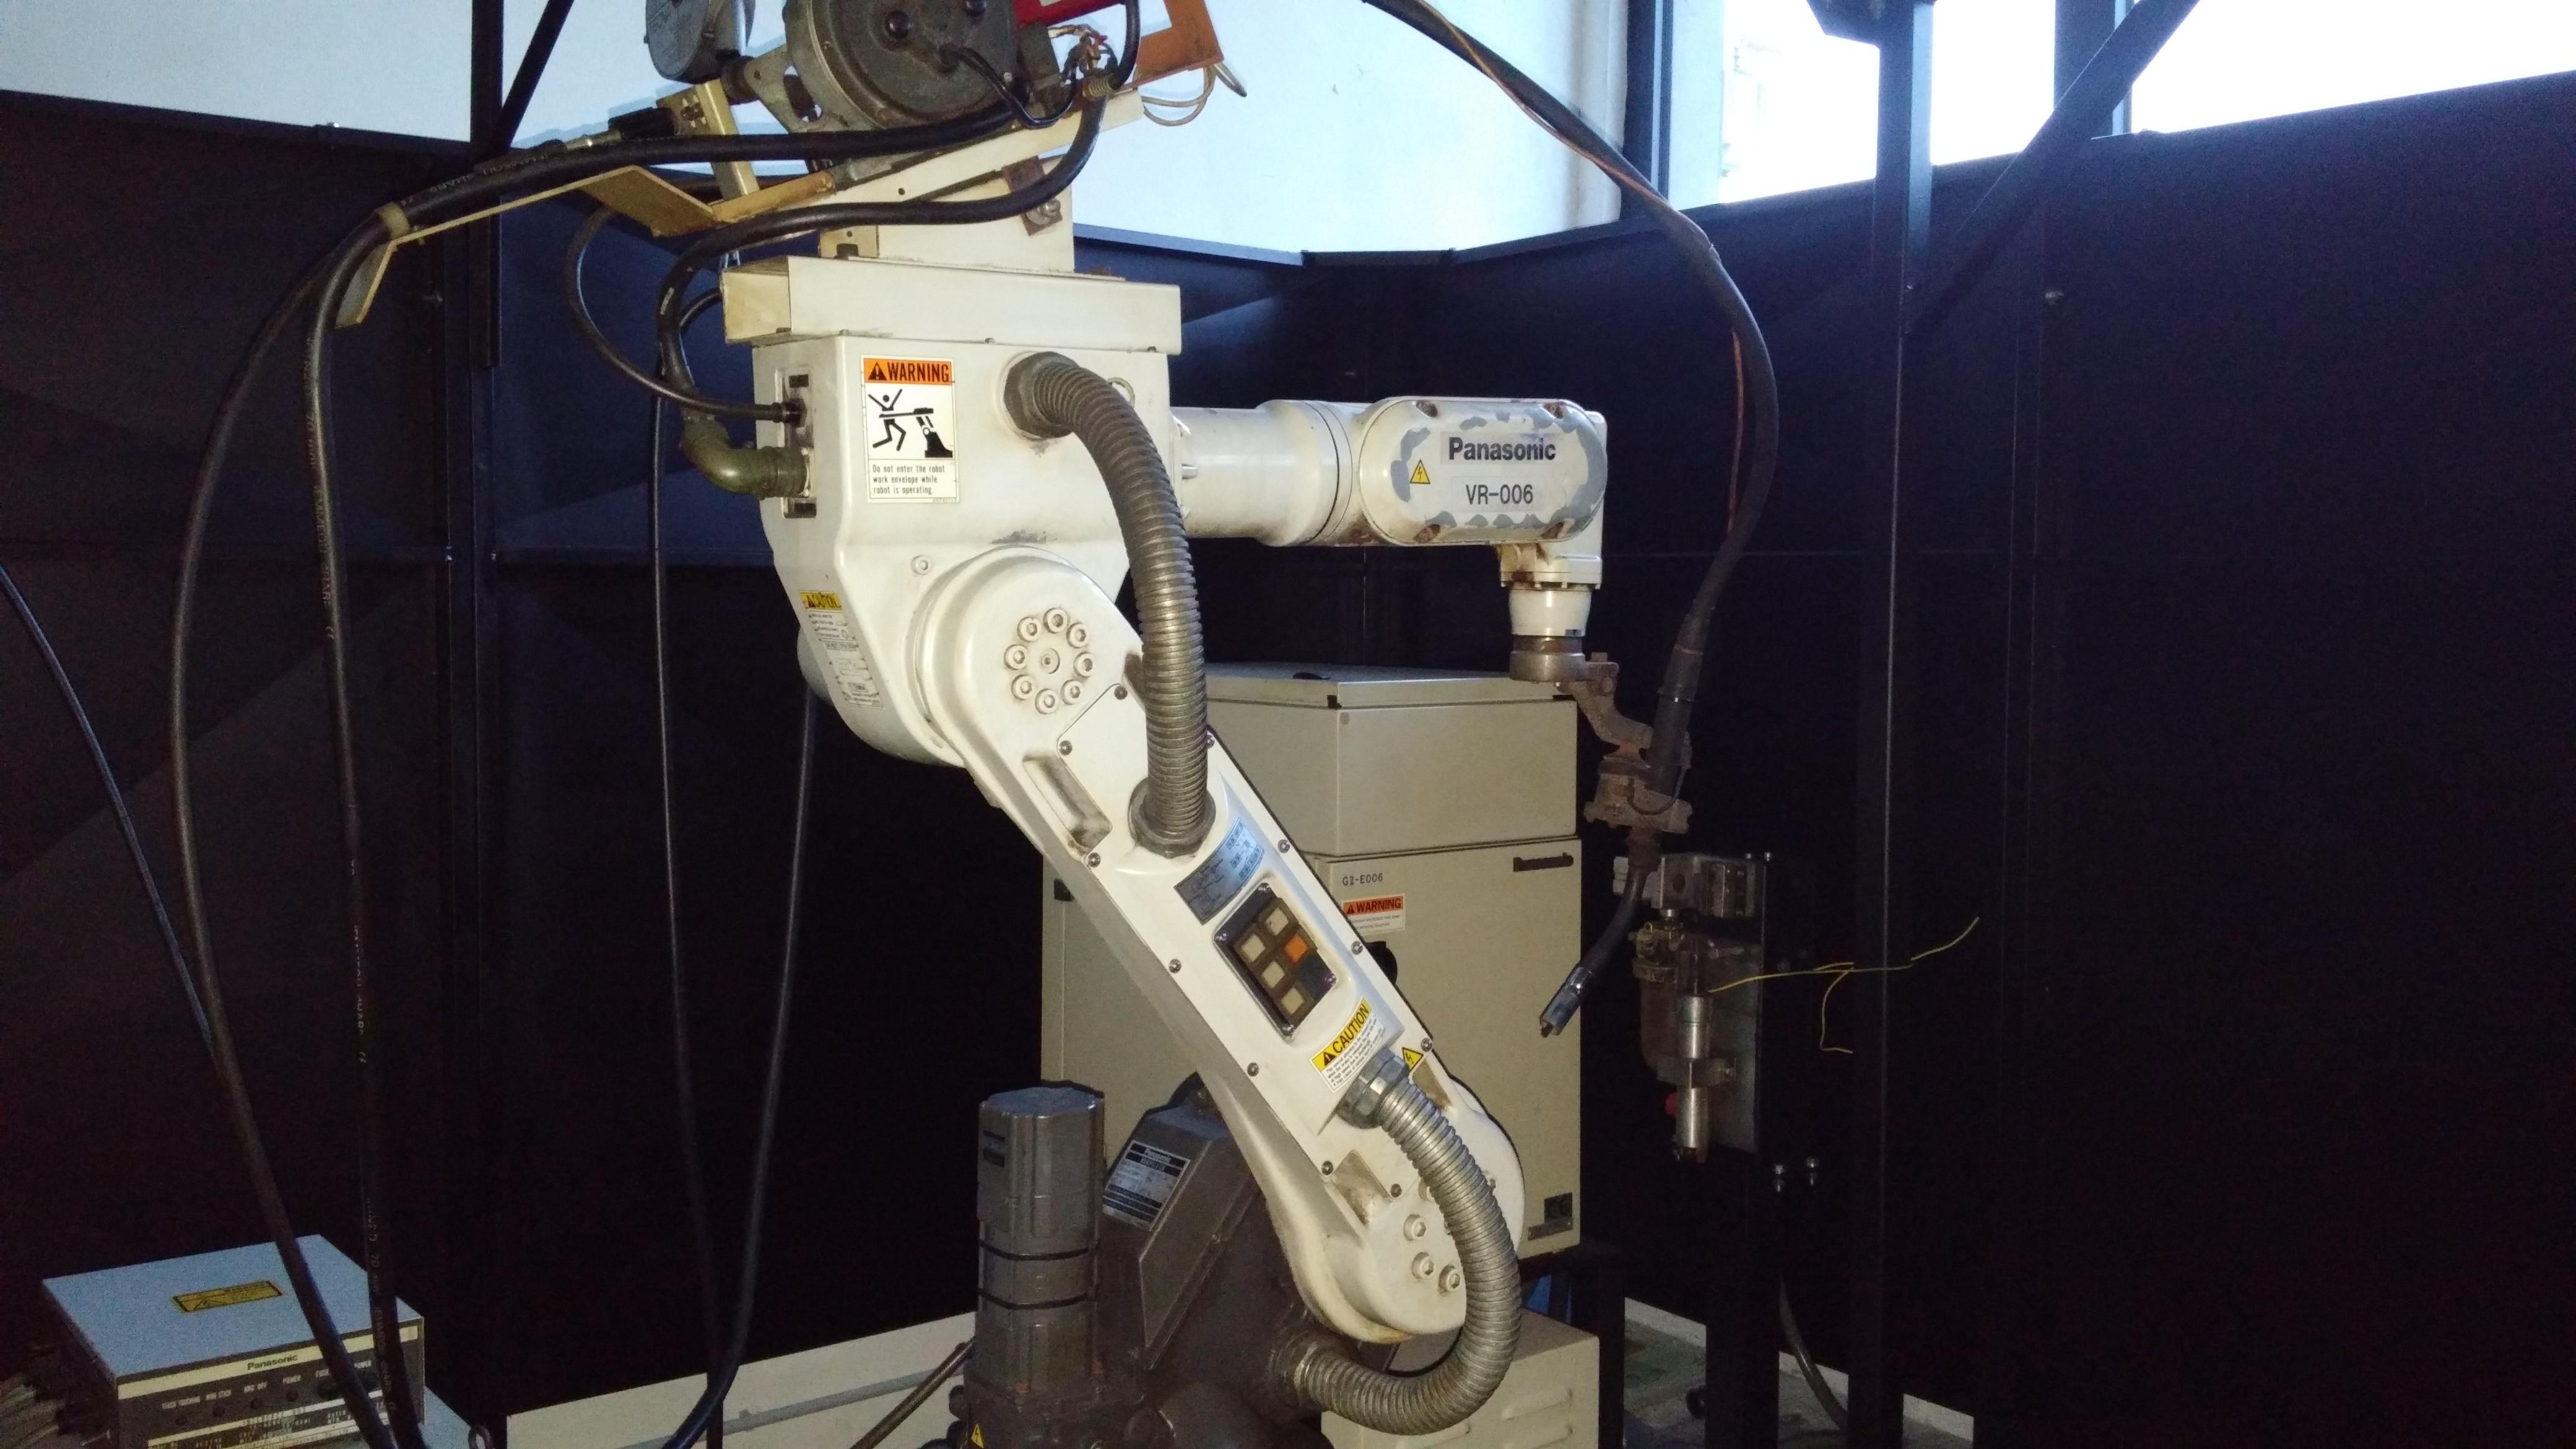 panasonic vr 006 gii industrial robot exapro rh exapro com